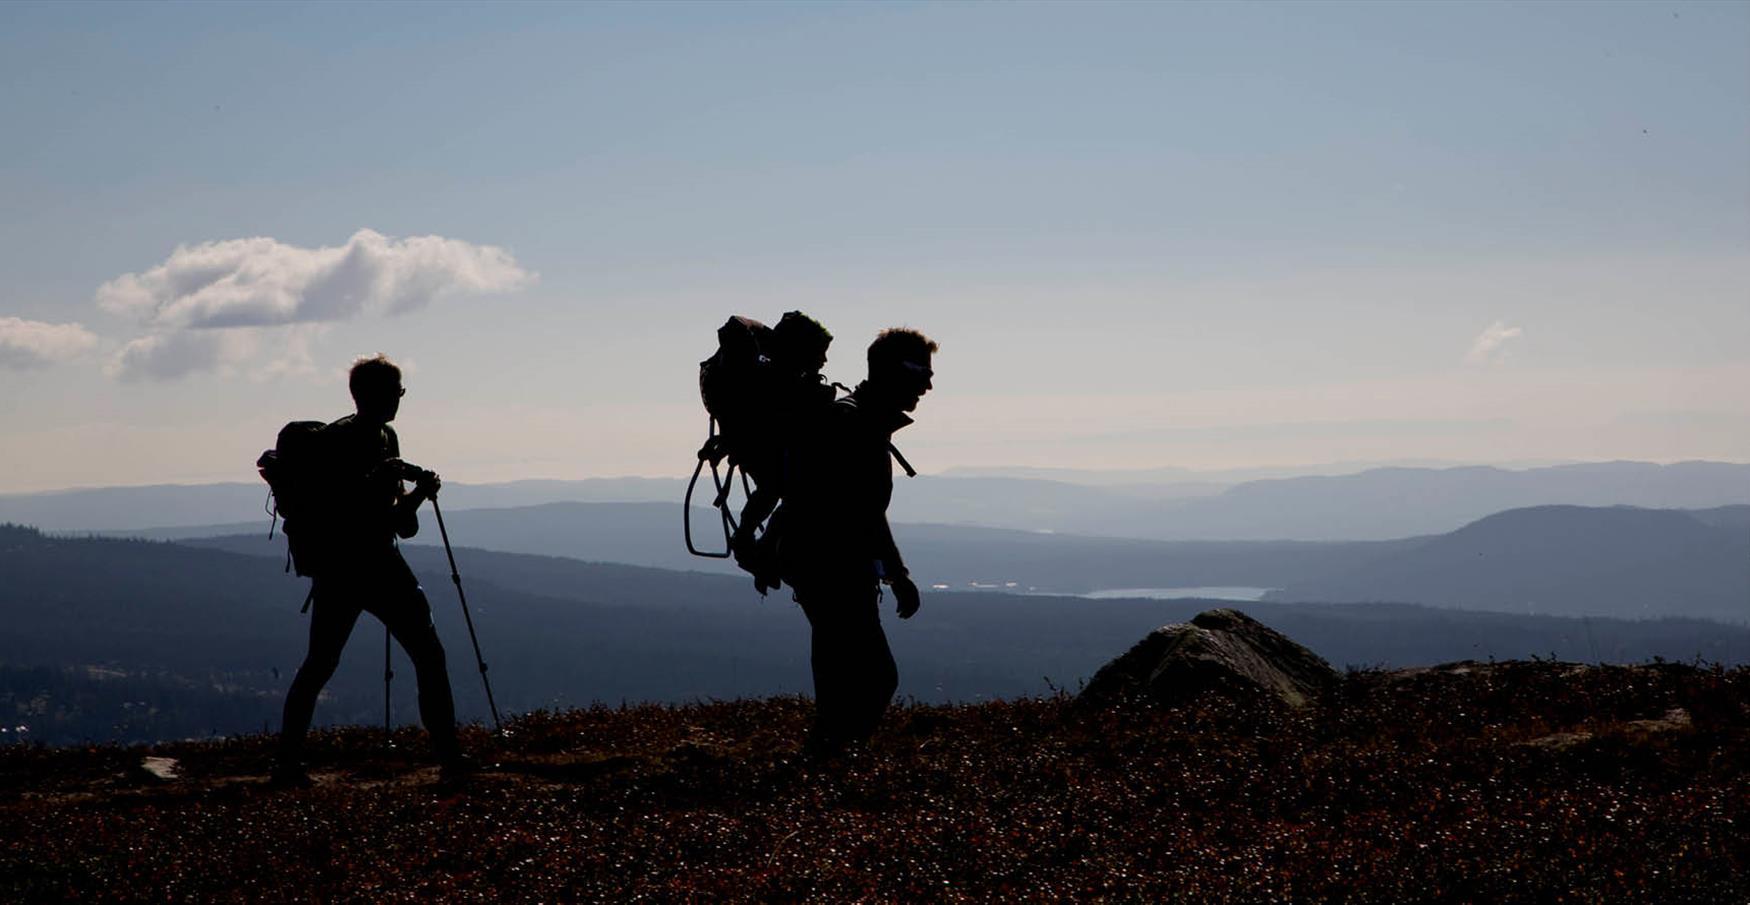 Official Tourist Information - Lillehammer and Gudbrandsdalen